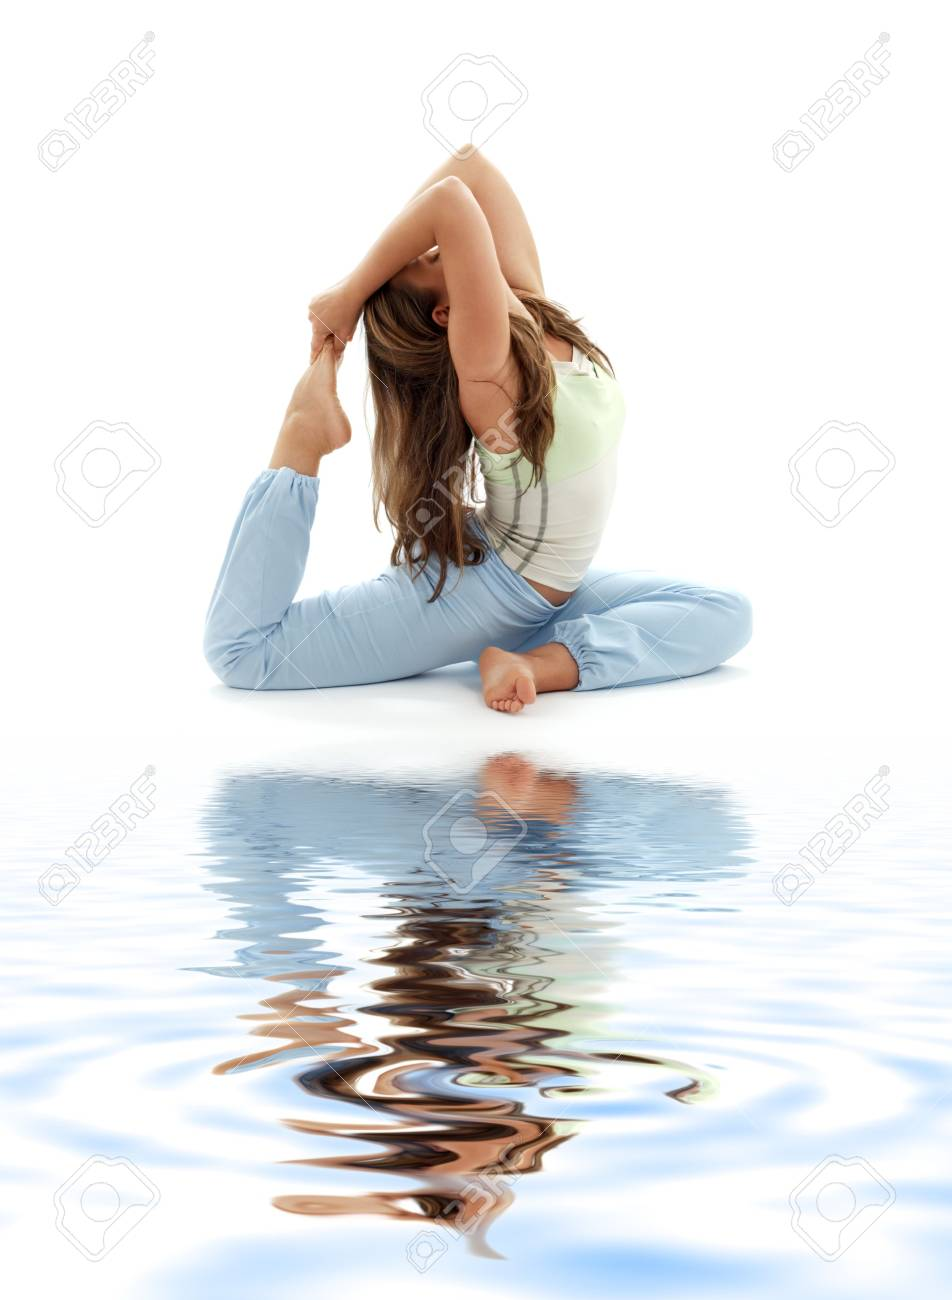 lovely girl practicing ashtanga yoga on white sand Stock Photo - 2623720